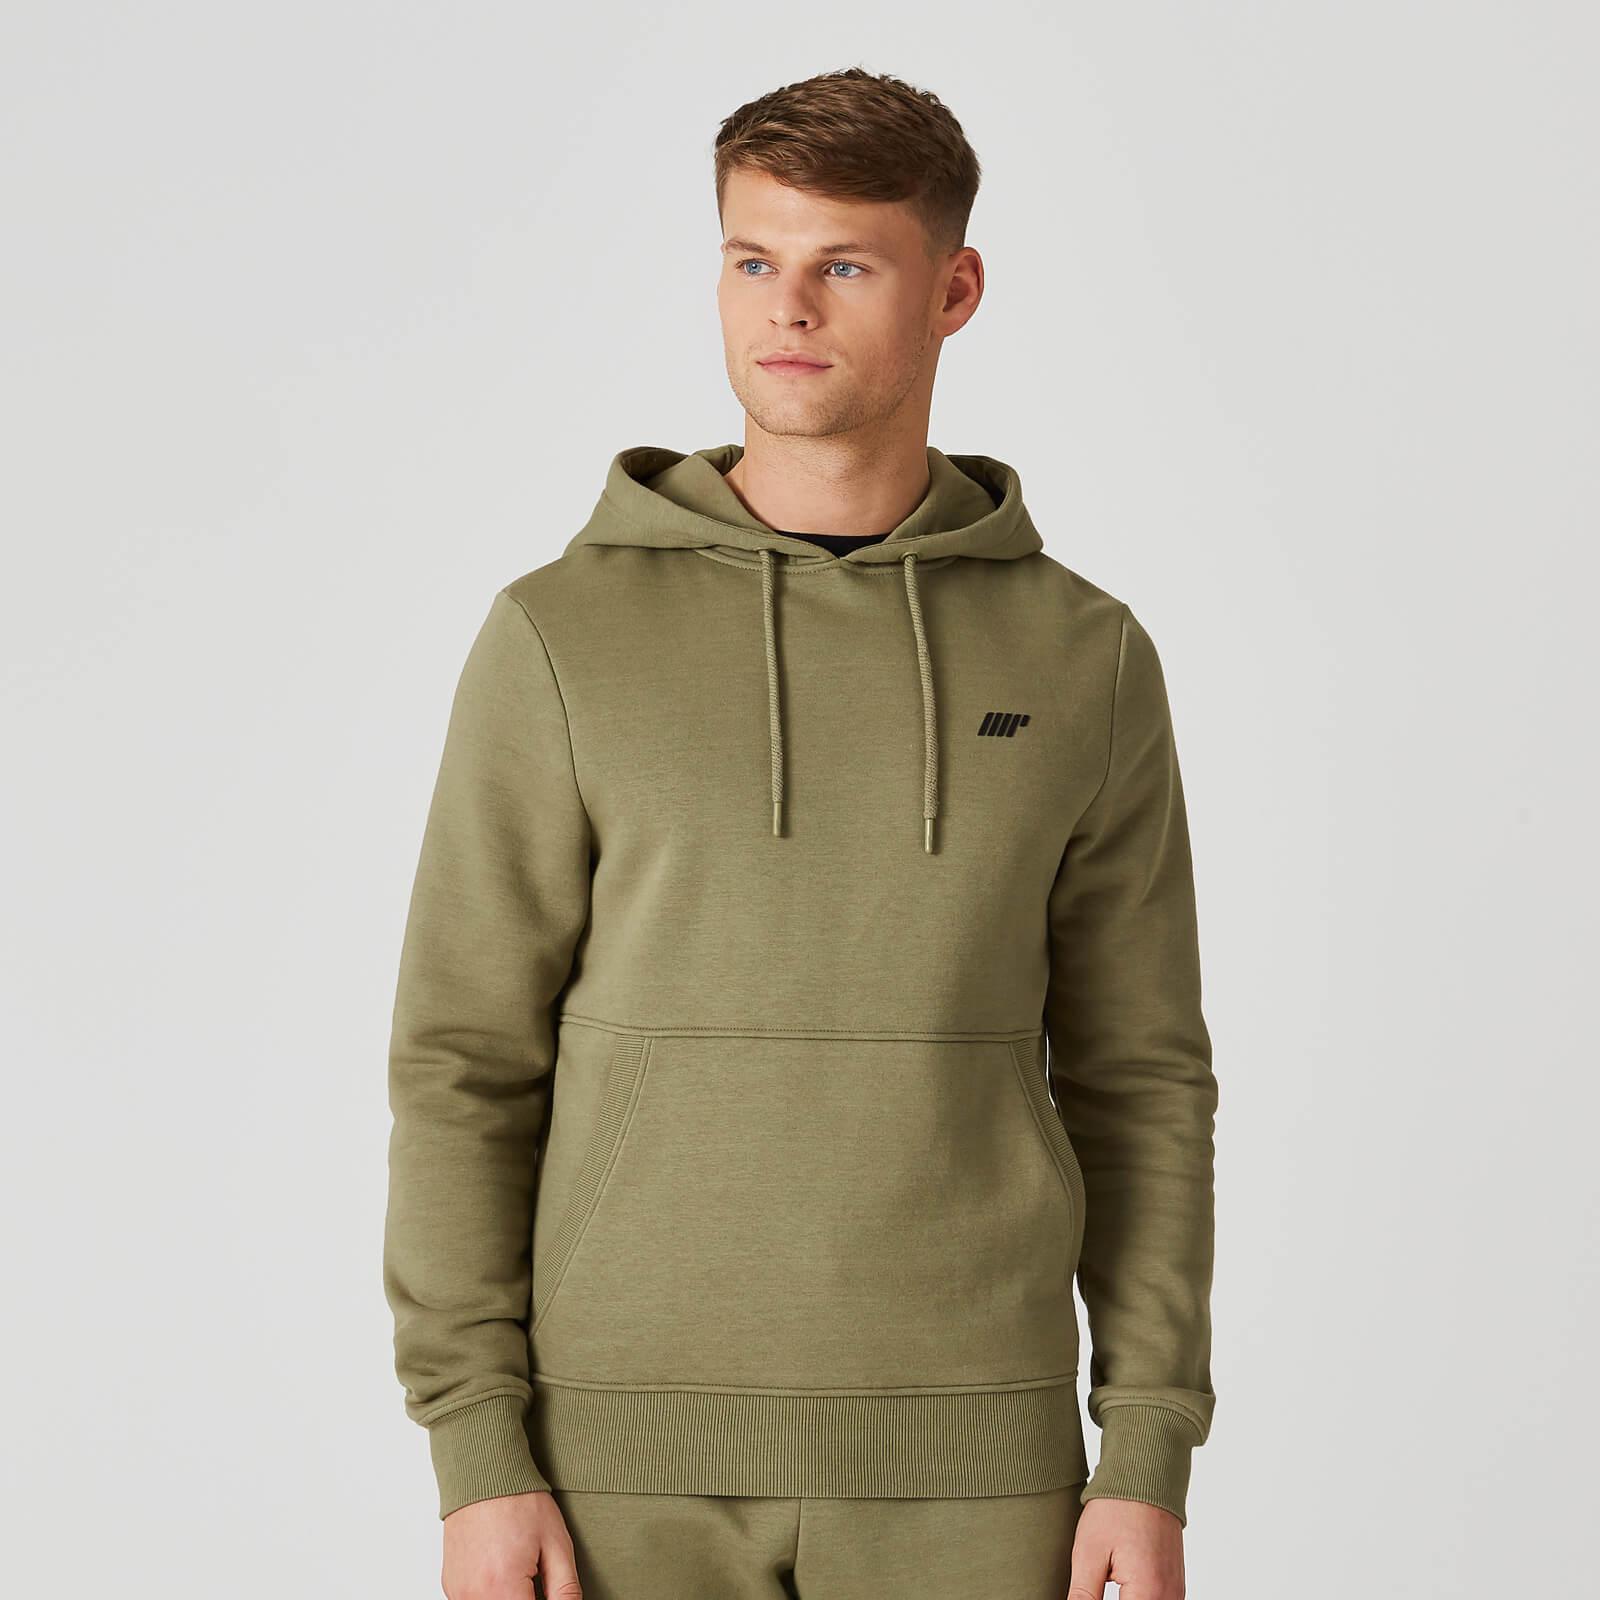 Tru Fit Pullover Hoodie 2.0 Light Olive